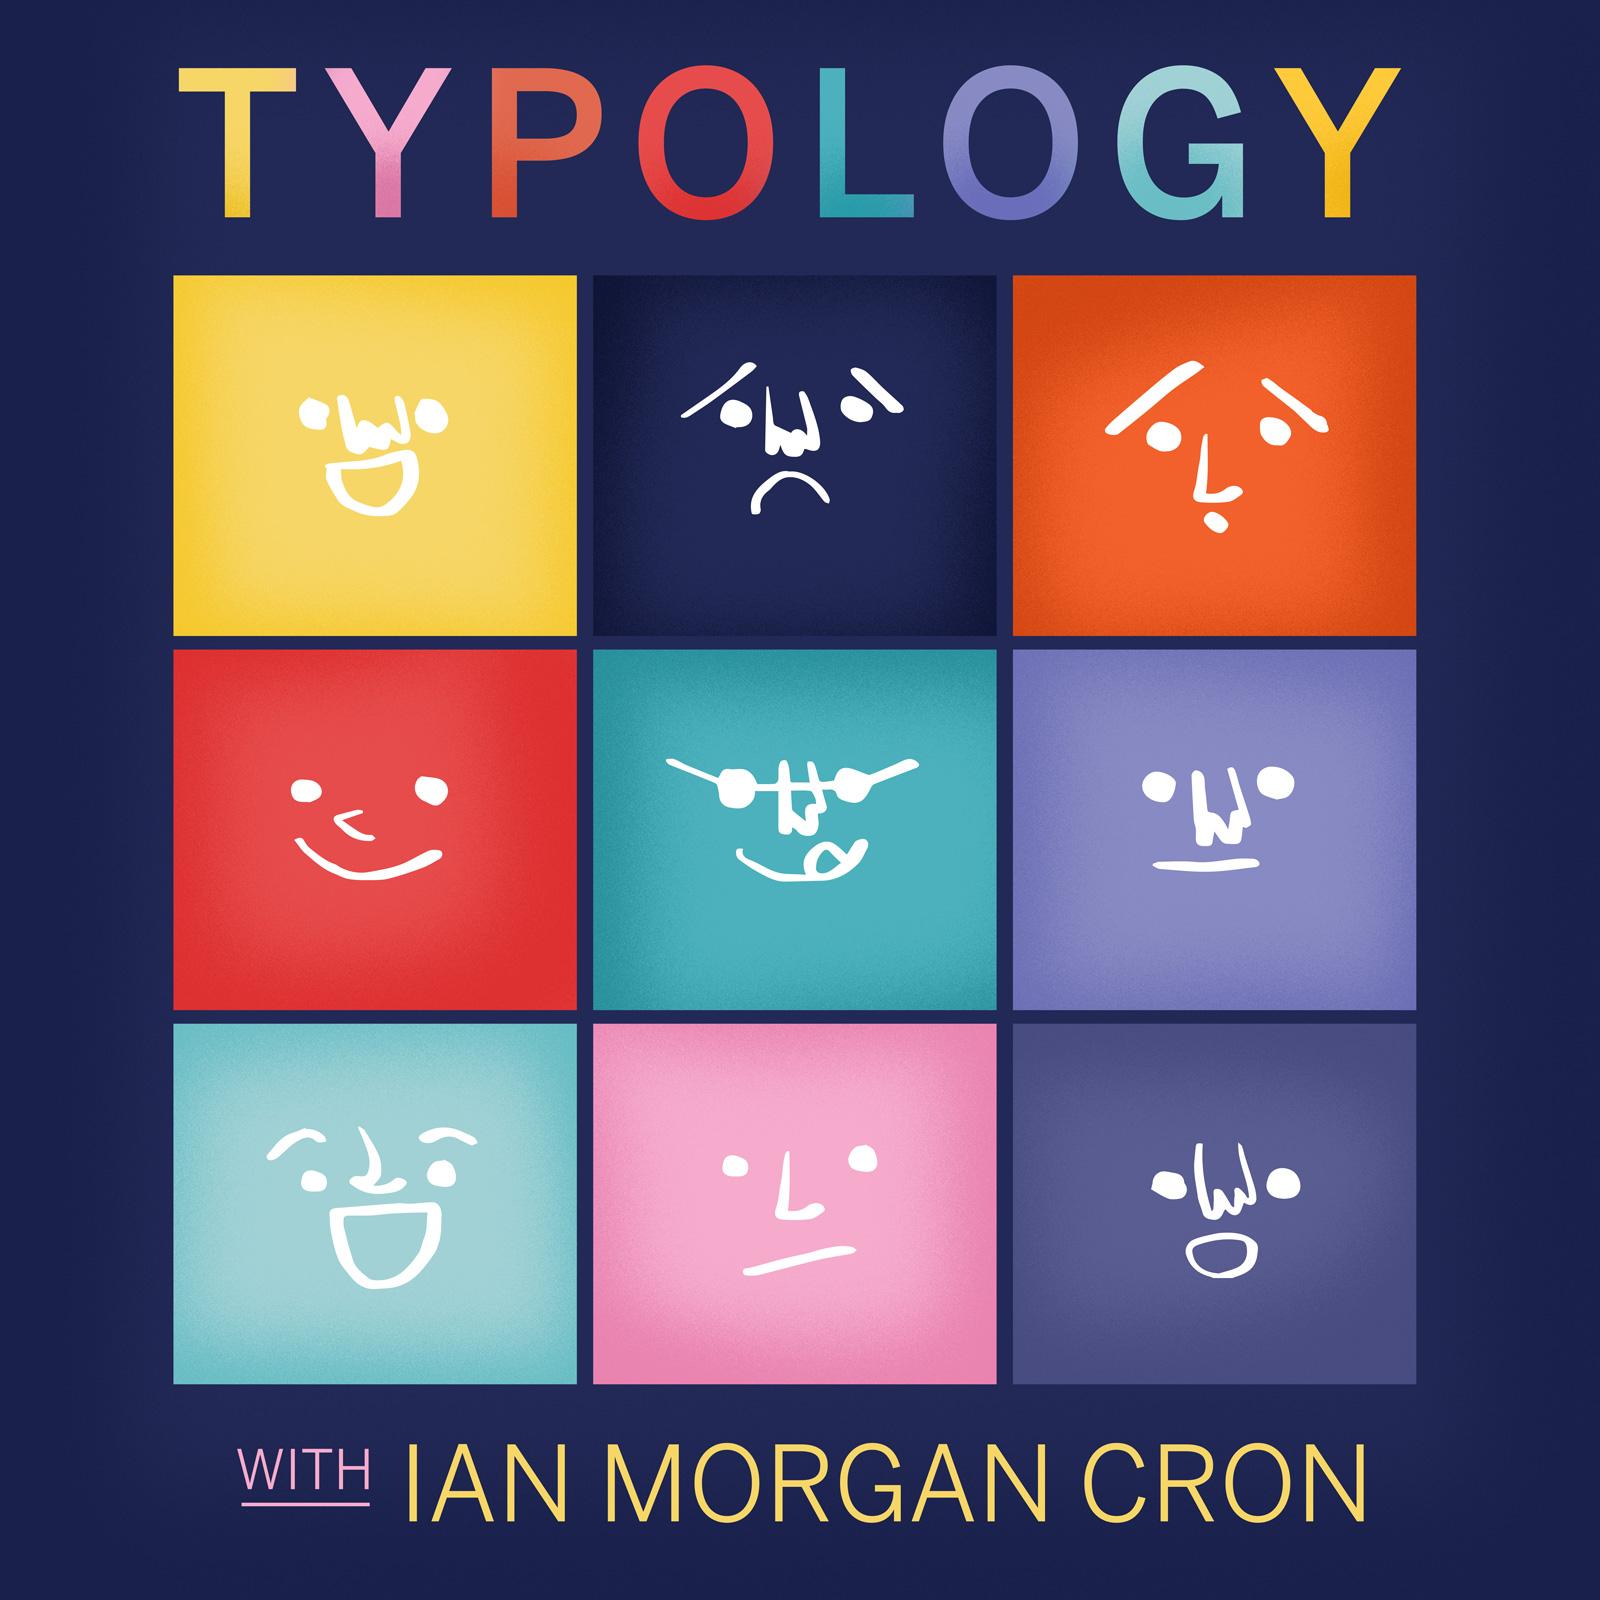 typology_1600px.jpg